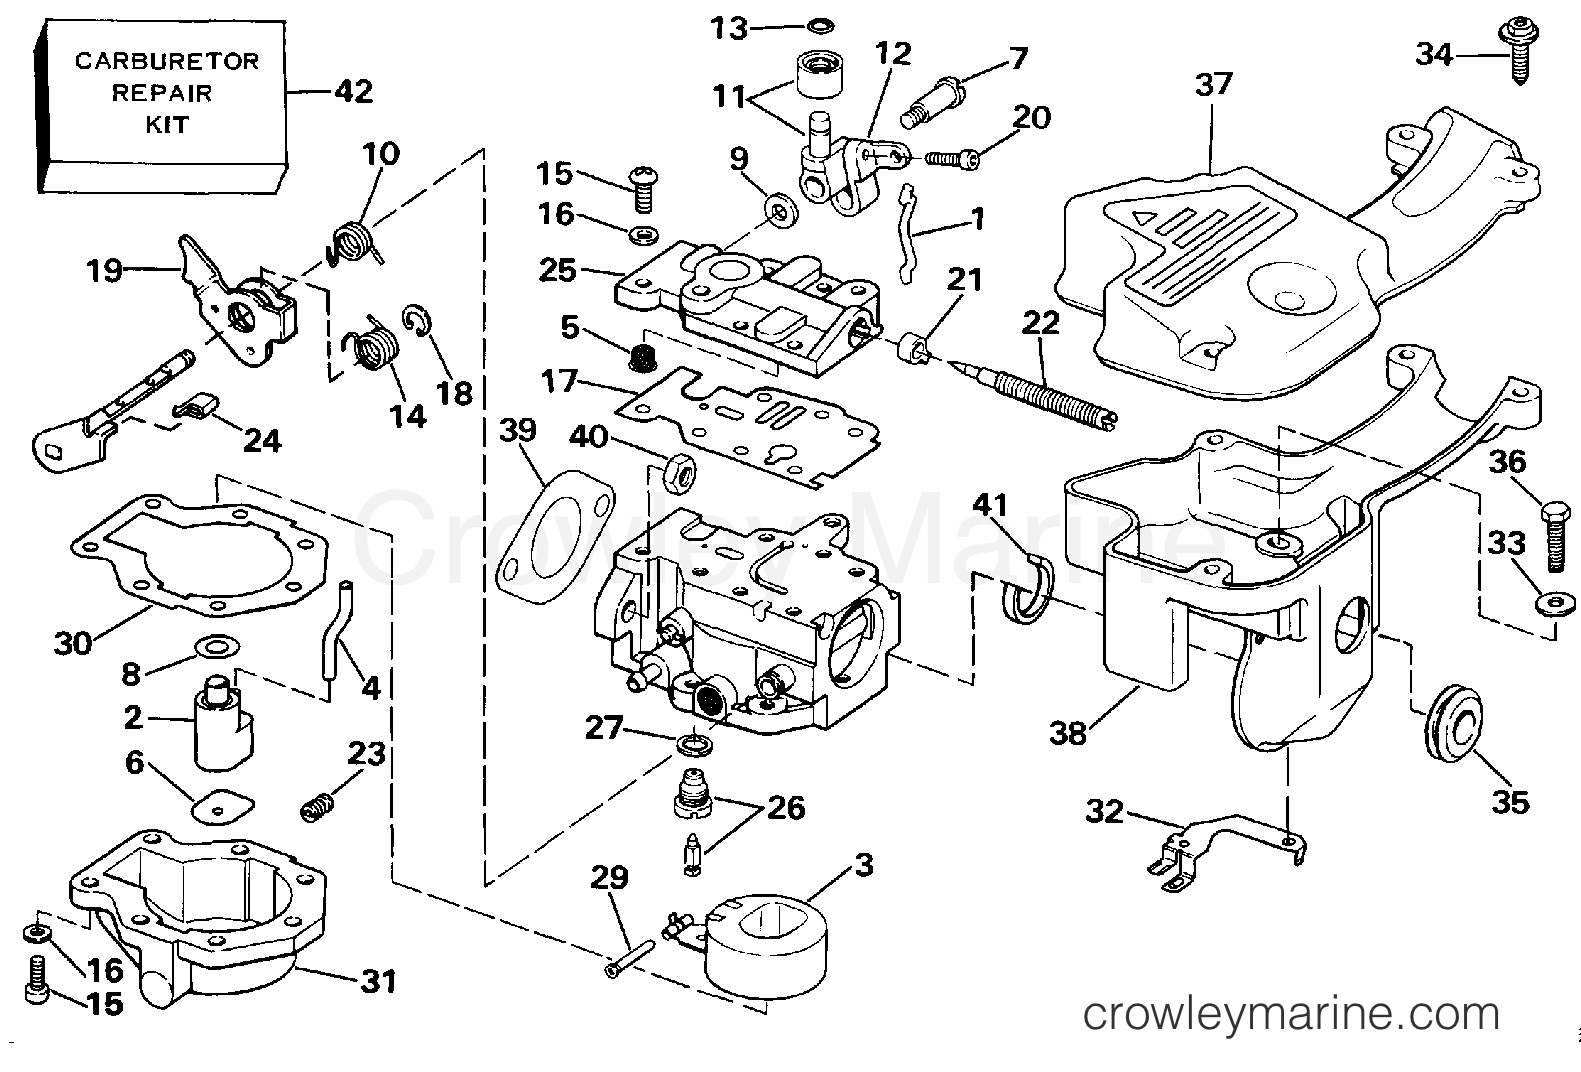 Carburetor Late Production